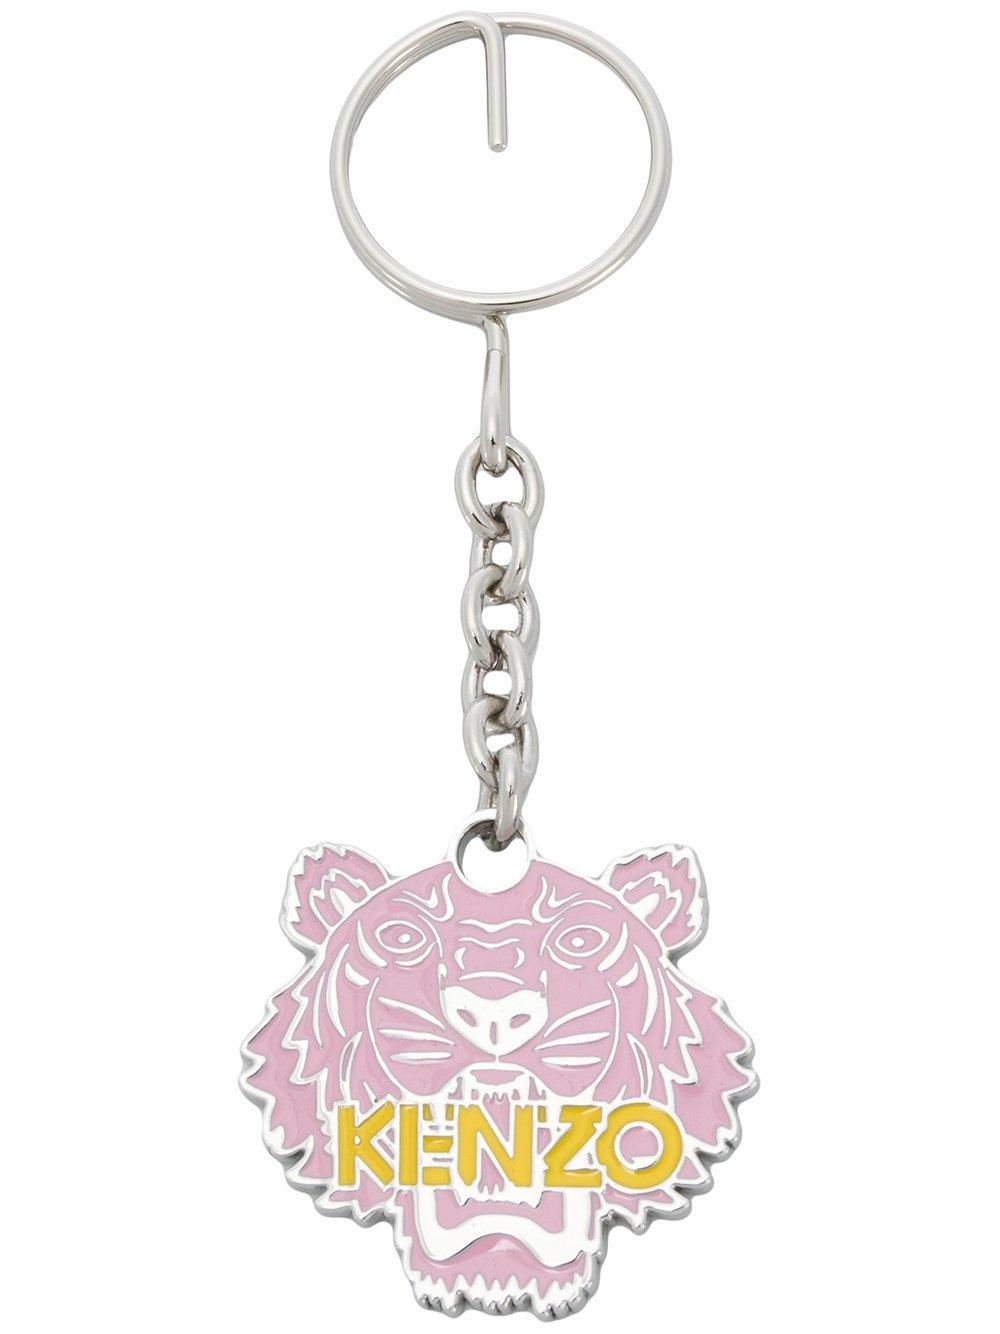 Kenzo Women's F665ac300o2132 Pink Metal Key Chain